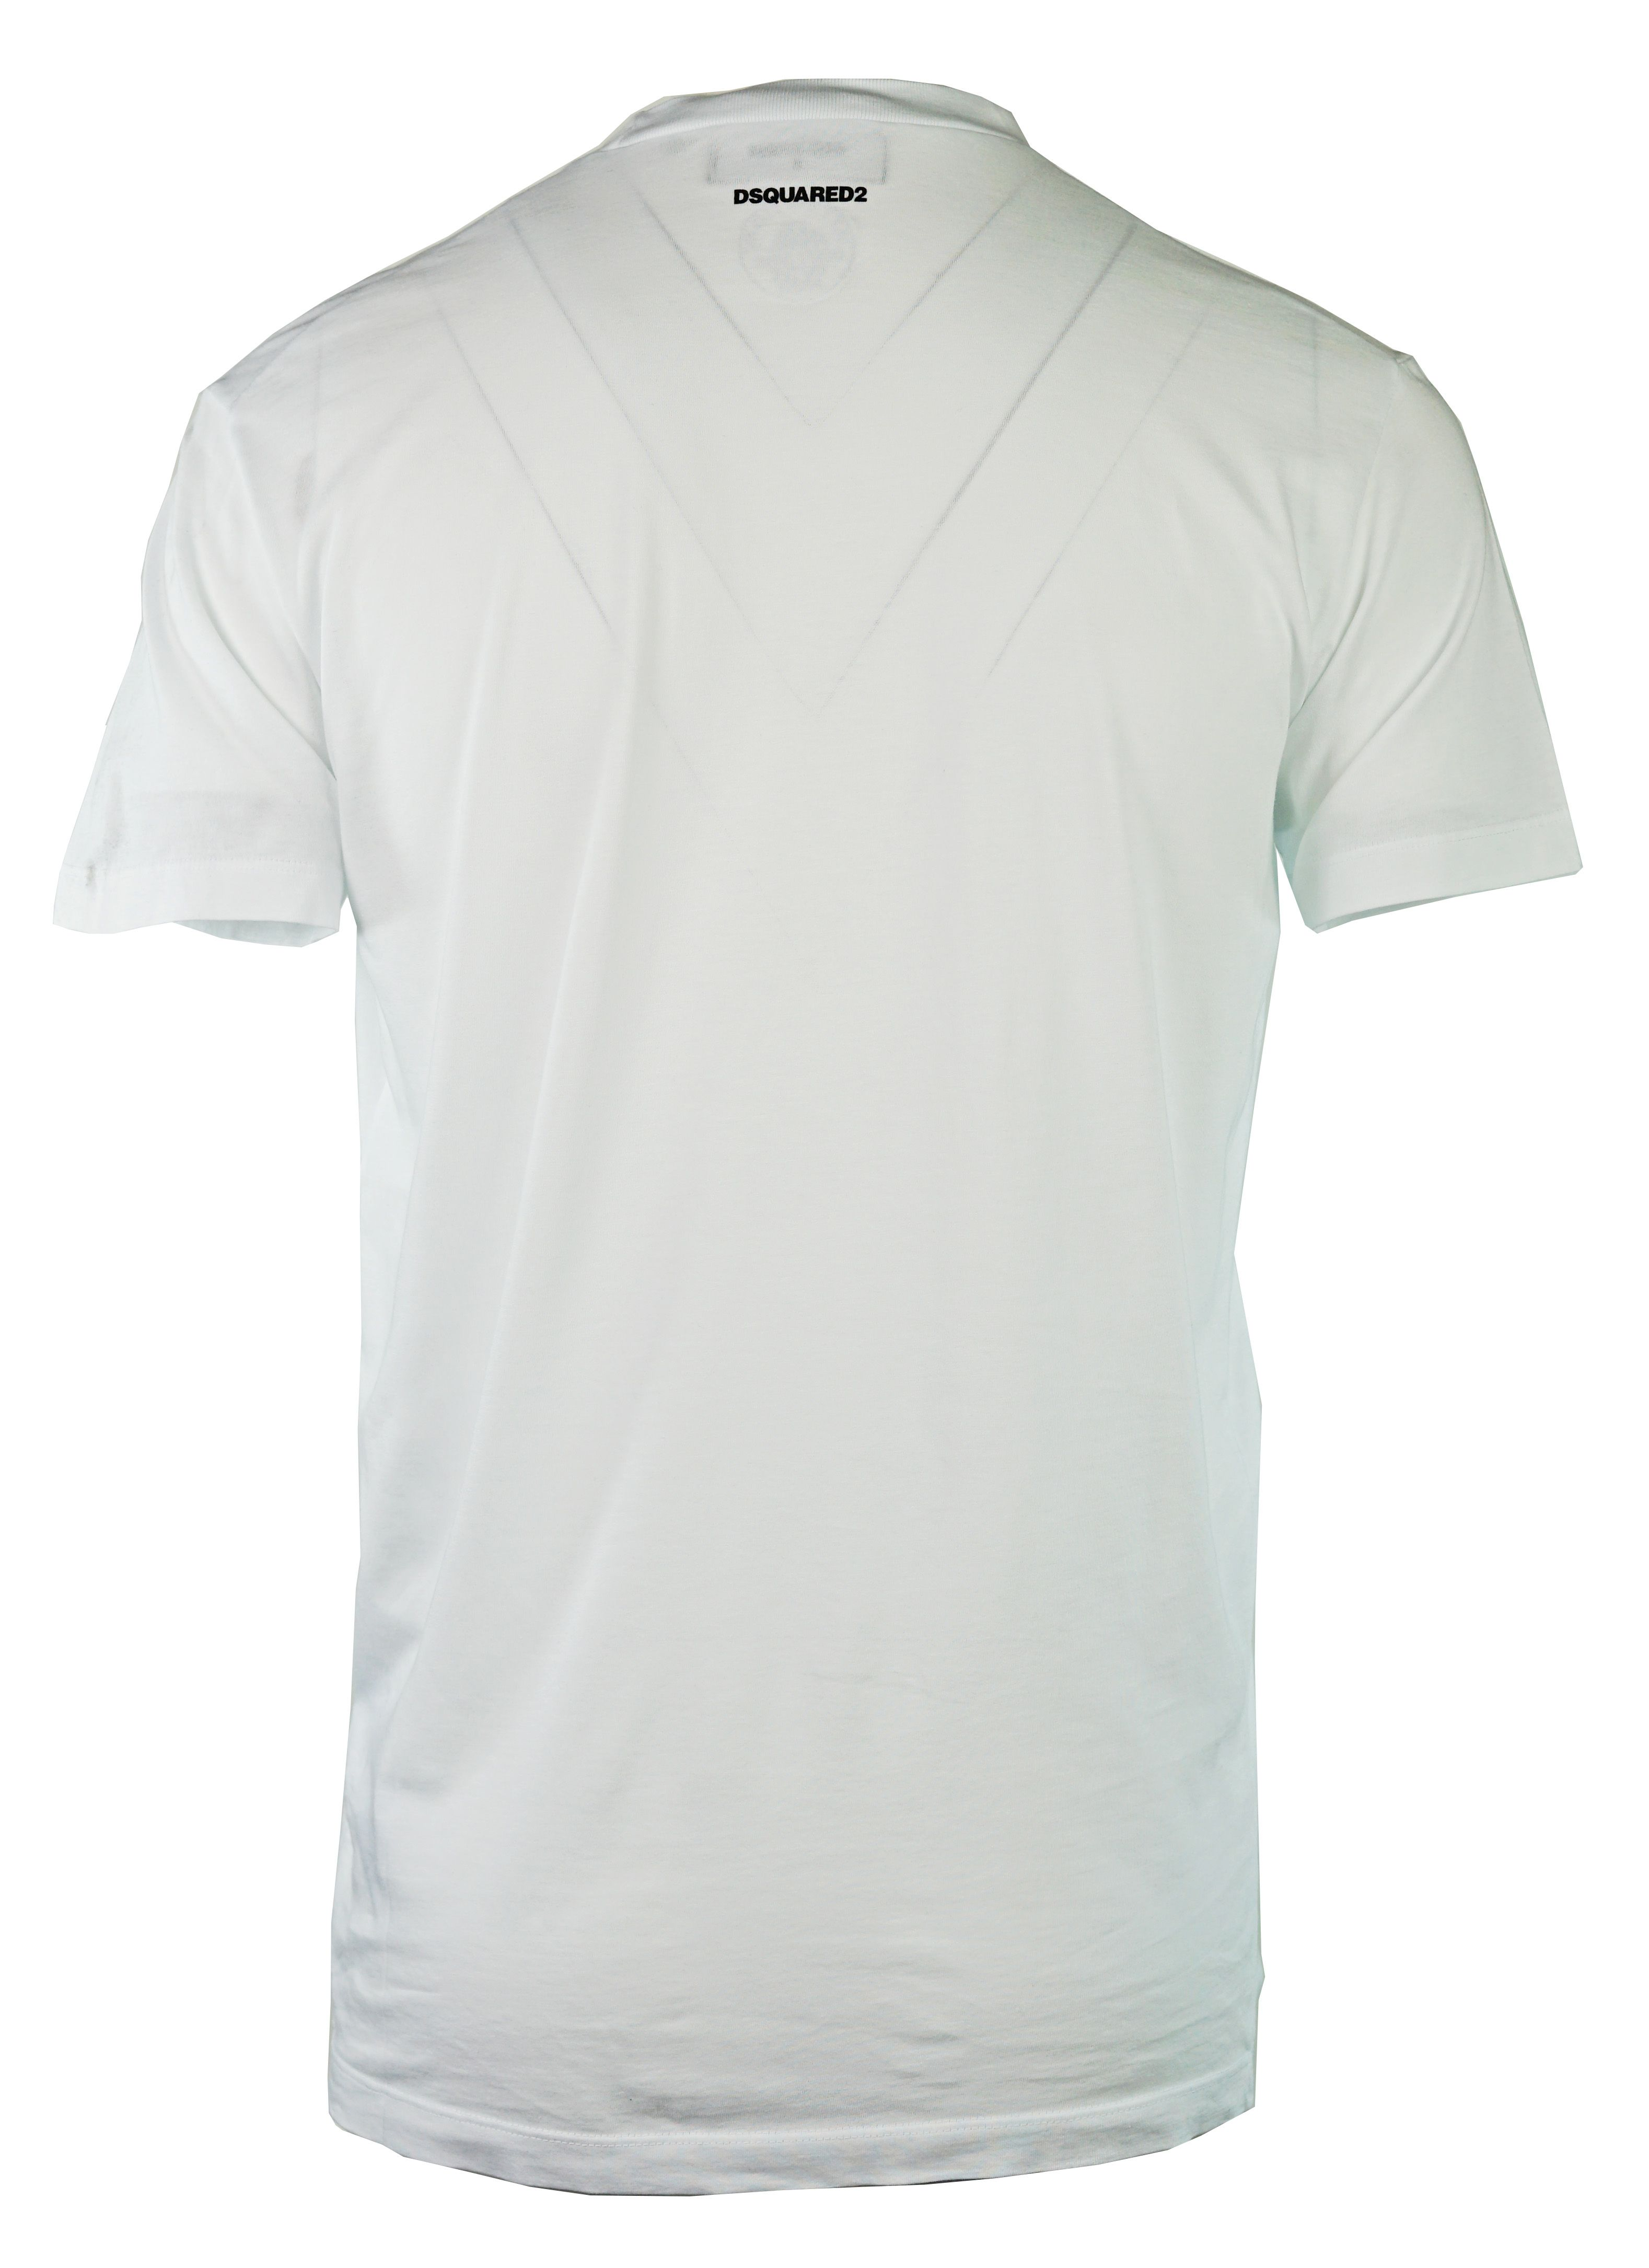 DSquared2 S71GD0683 S21600 100 T-Shirt